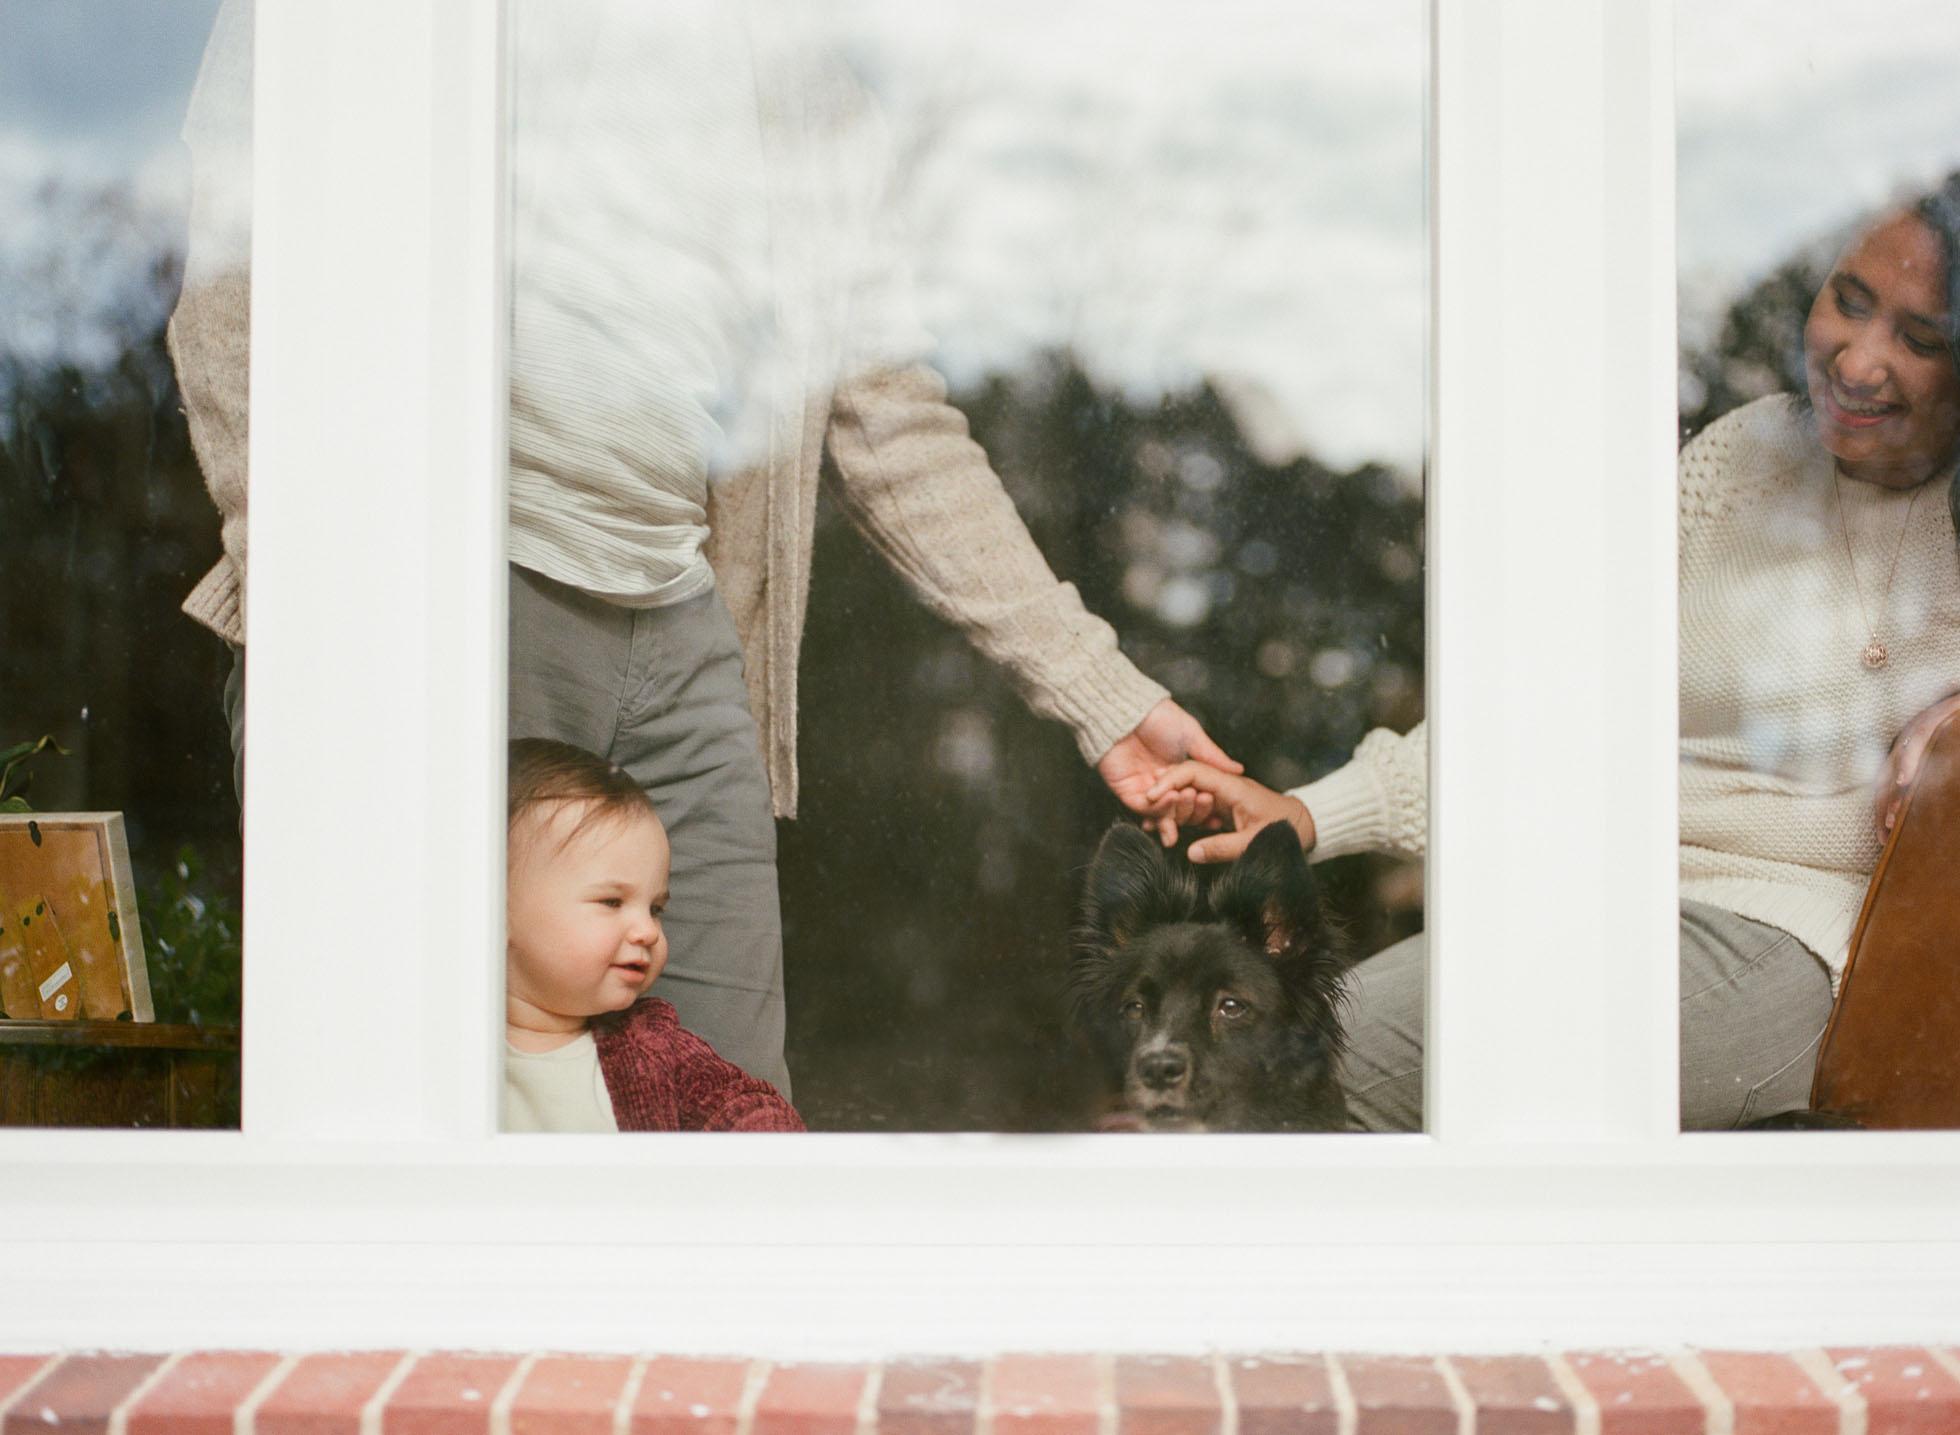 durham-lifestyle-family-photography-0001